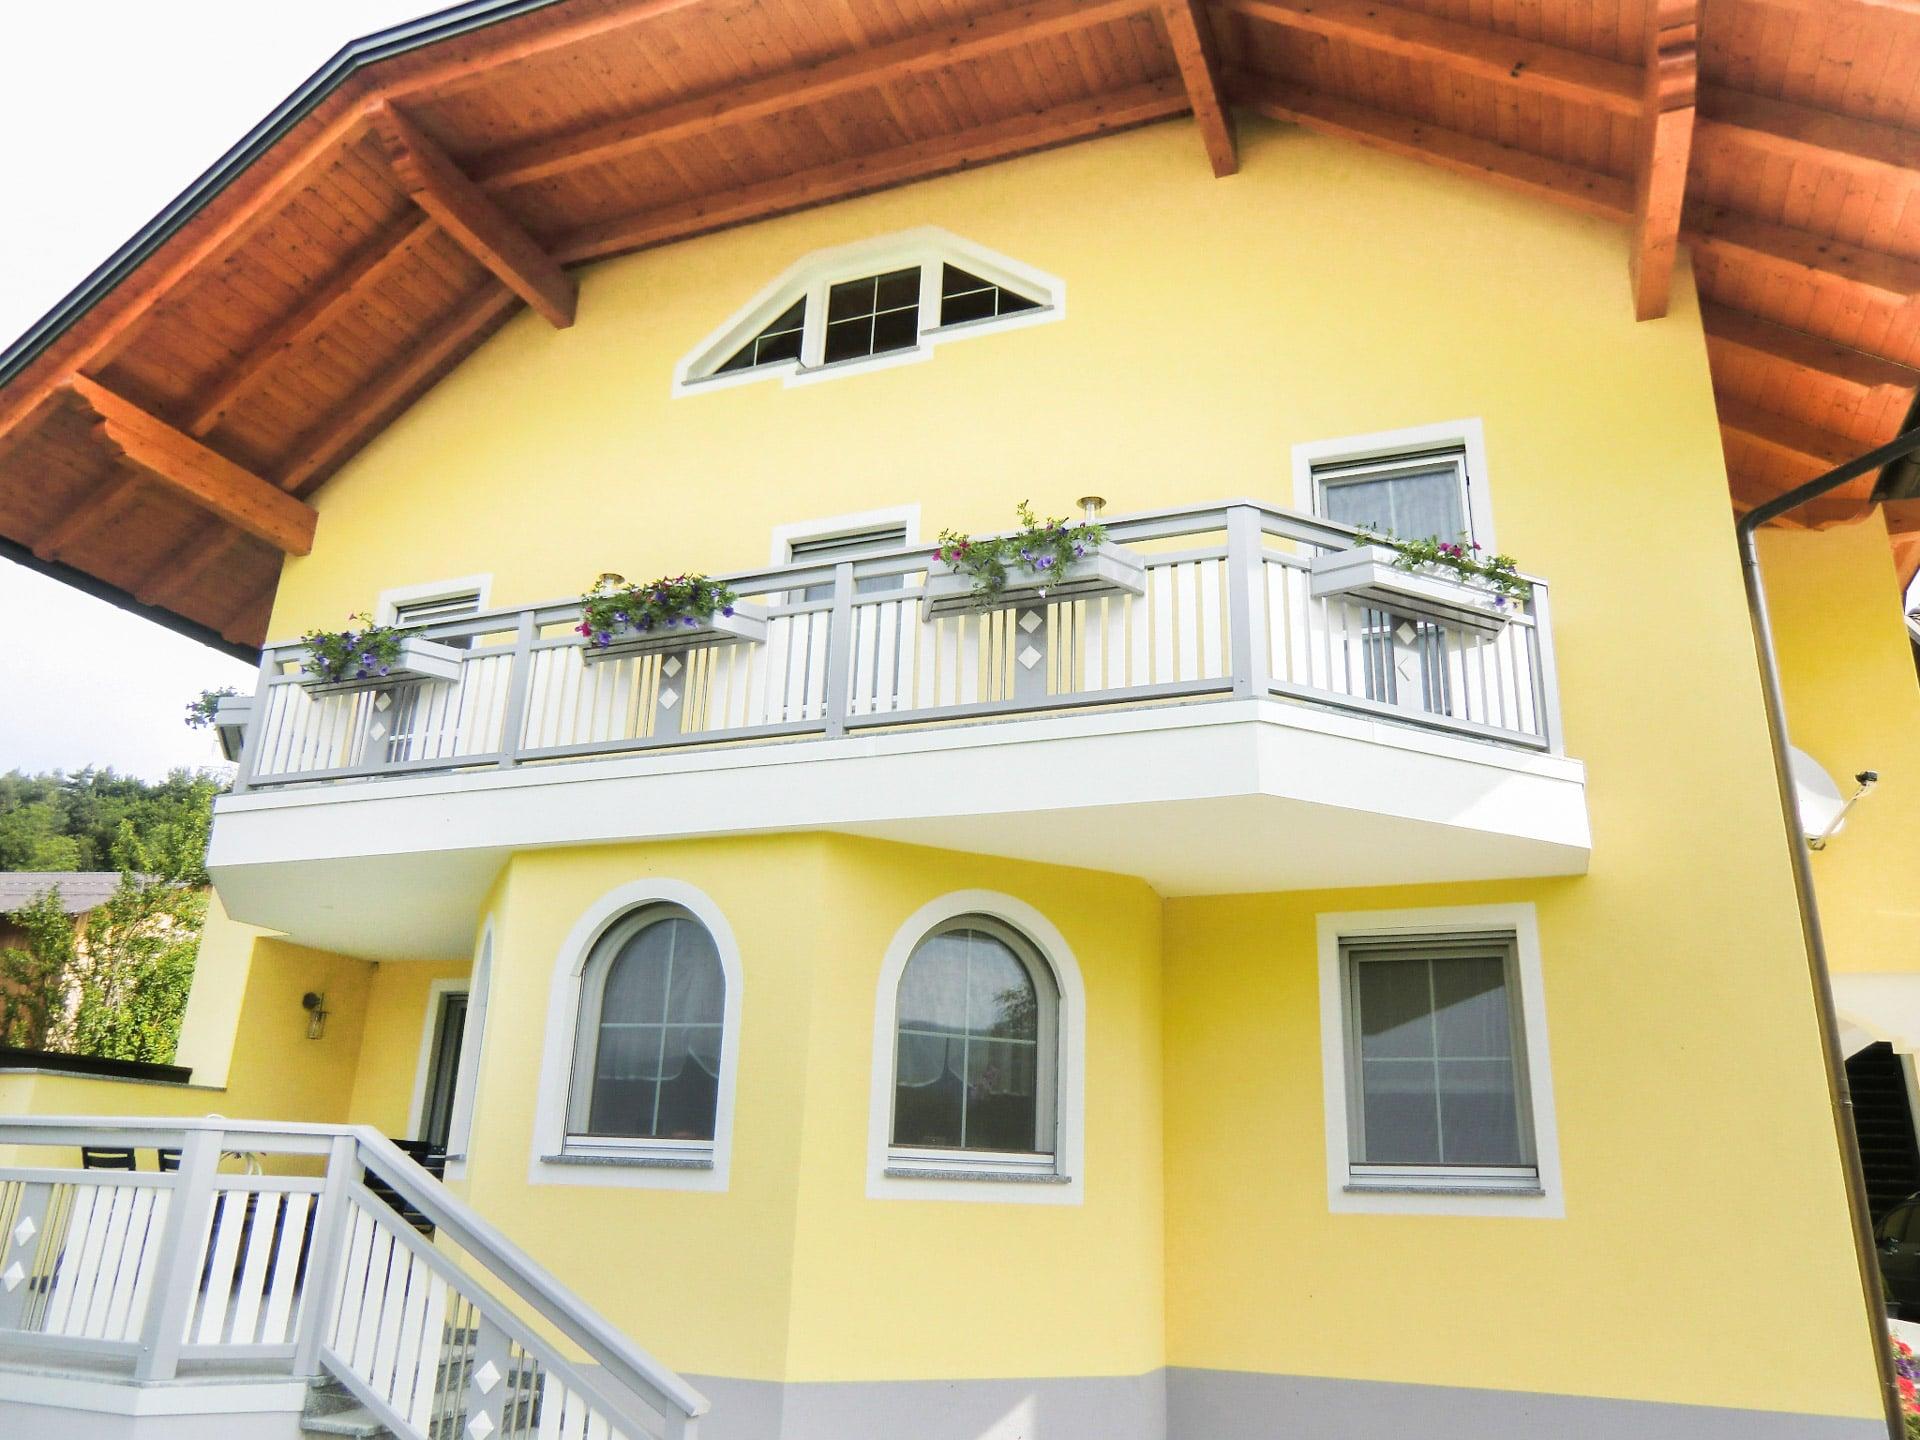 Lustenau 25 | Alu Balkon mit senkrechten Alulatten & Niro Stäben, Balkonkästen mit Blumen | Svoboda